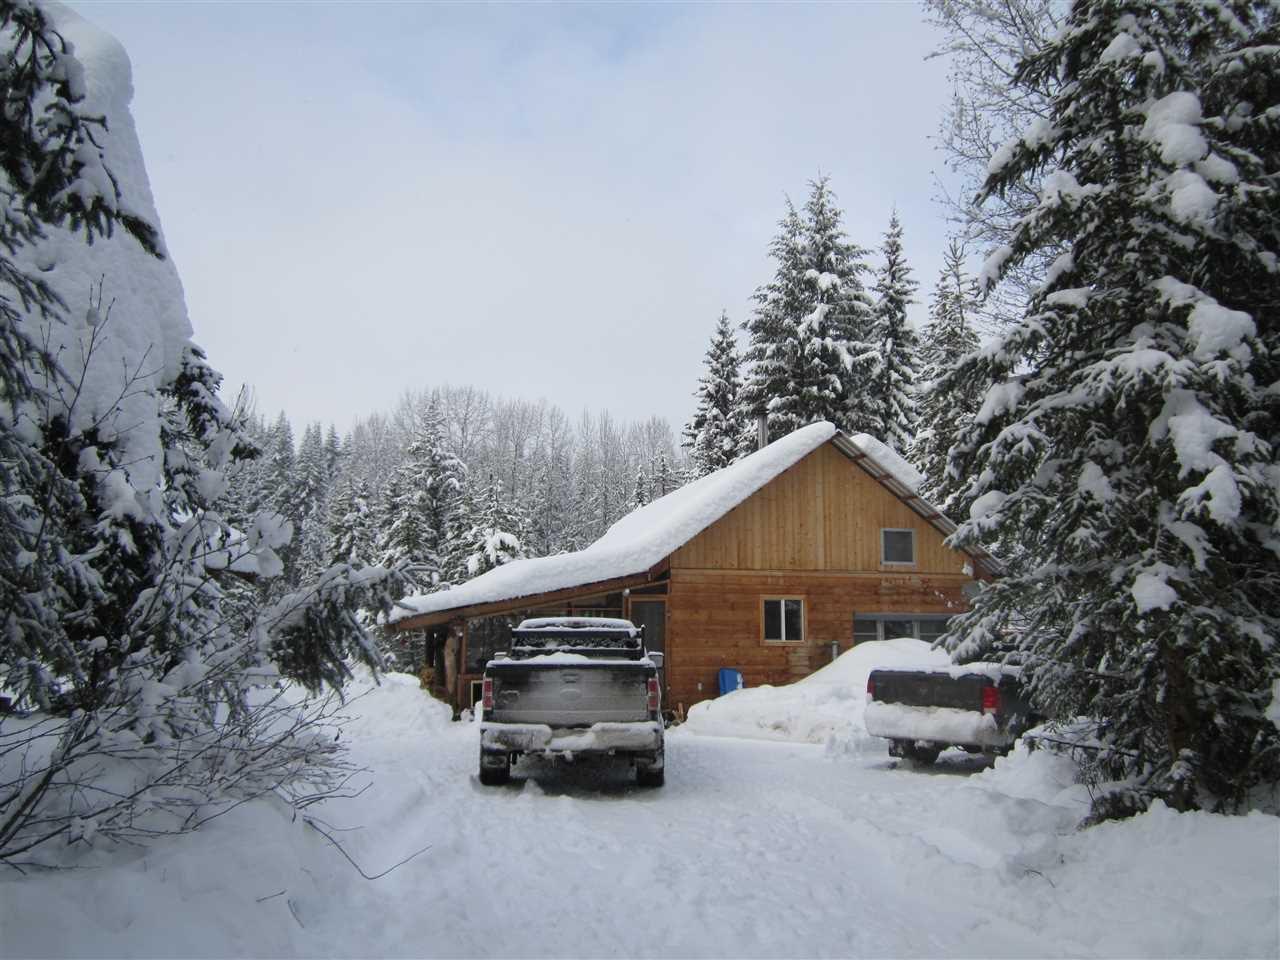 Main Photo: 4130 GAVIN LAKE Road: Horsefly House for sale (Williams Lake (Zone 27))  : MLS®# R2031032